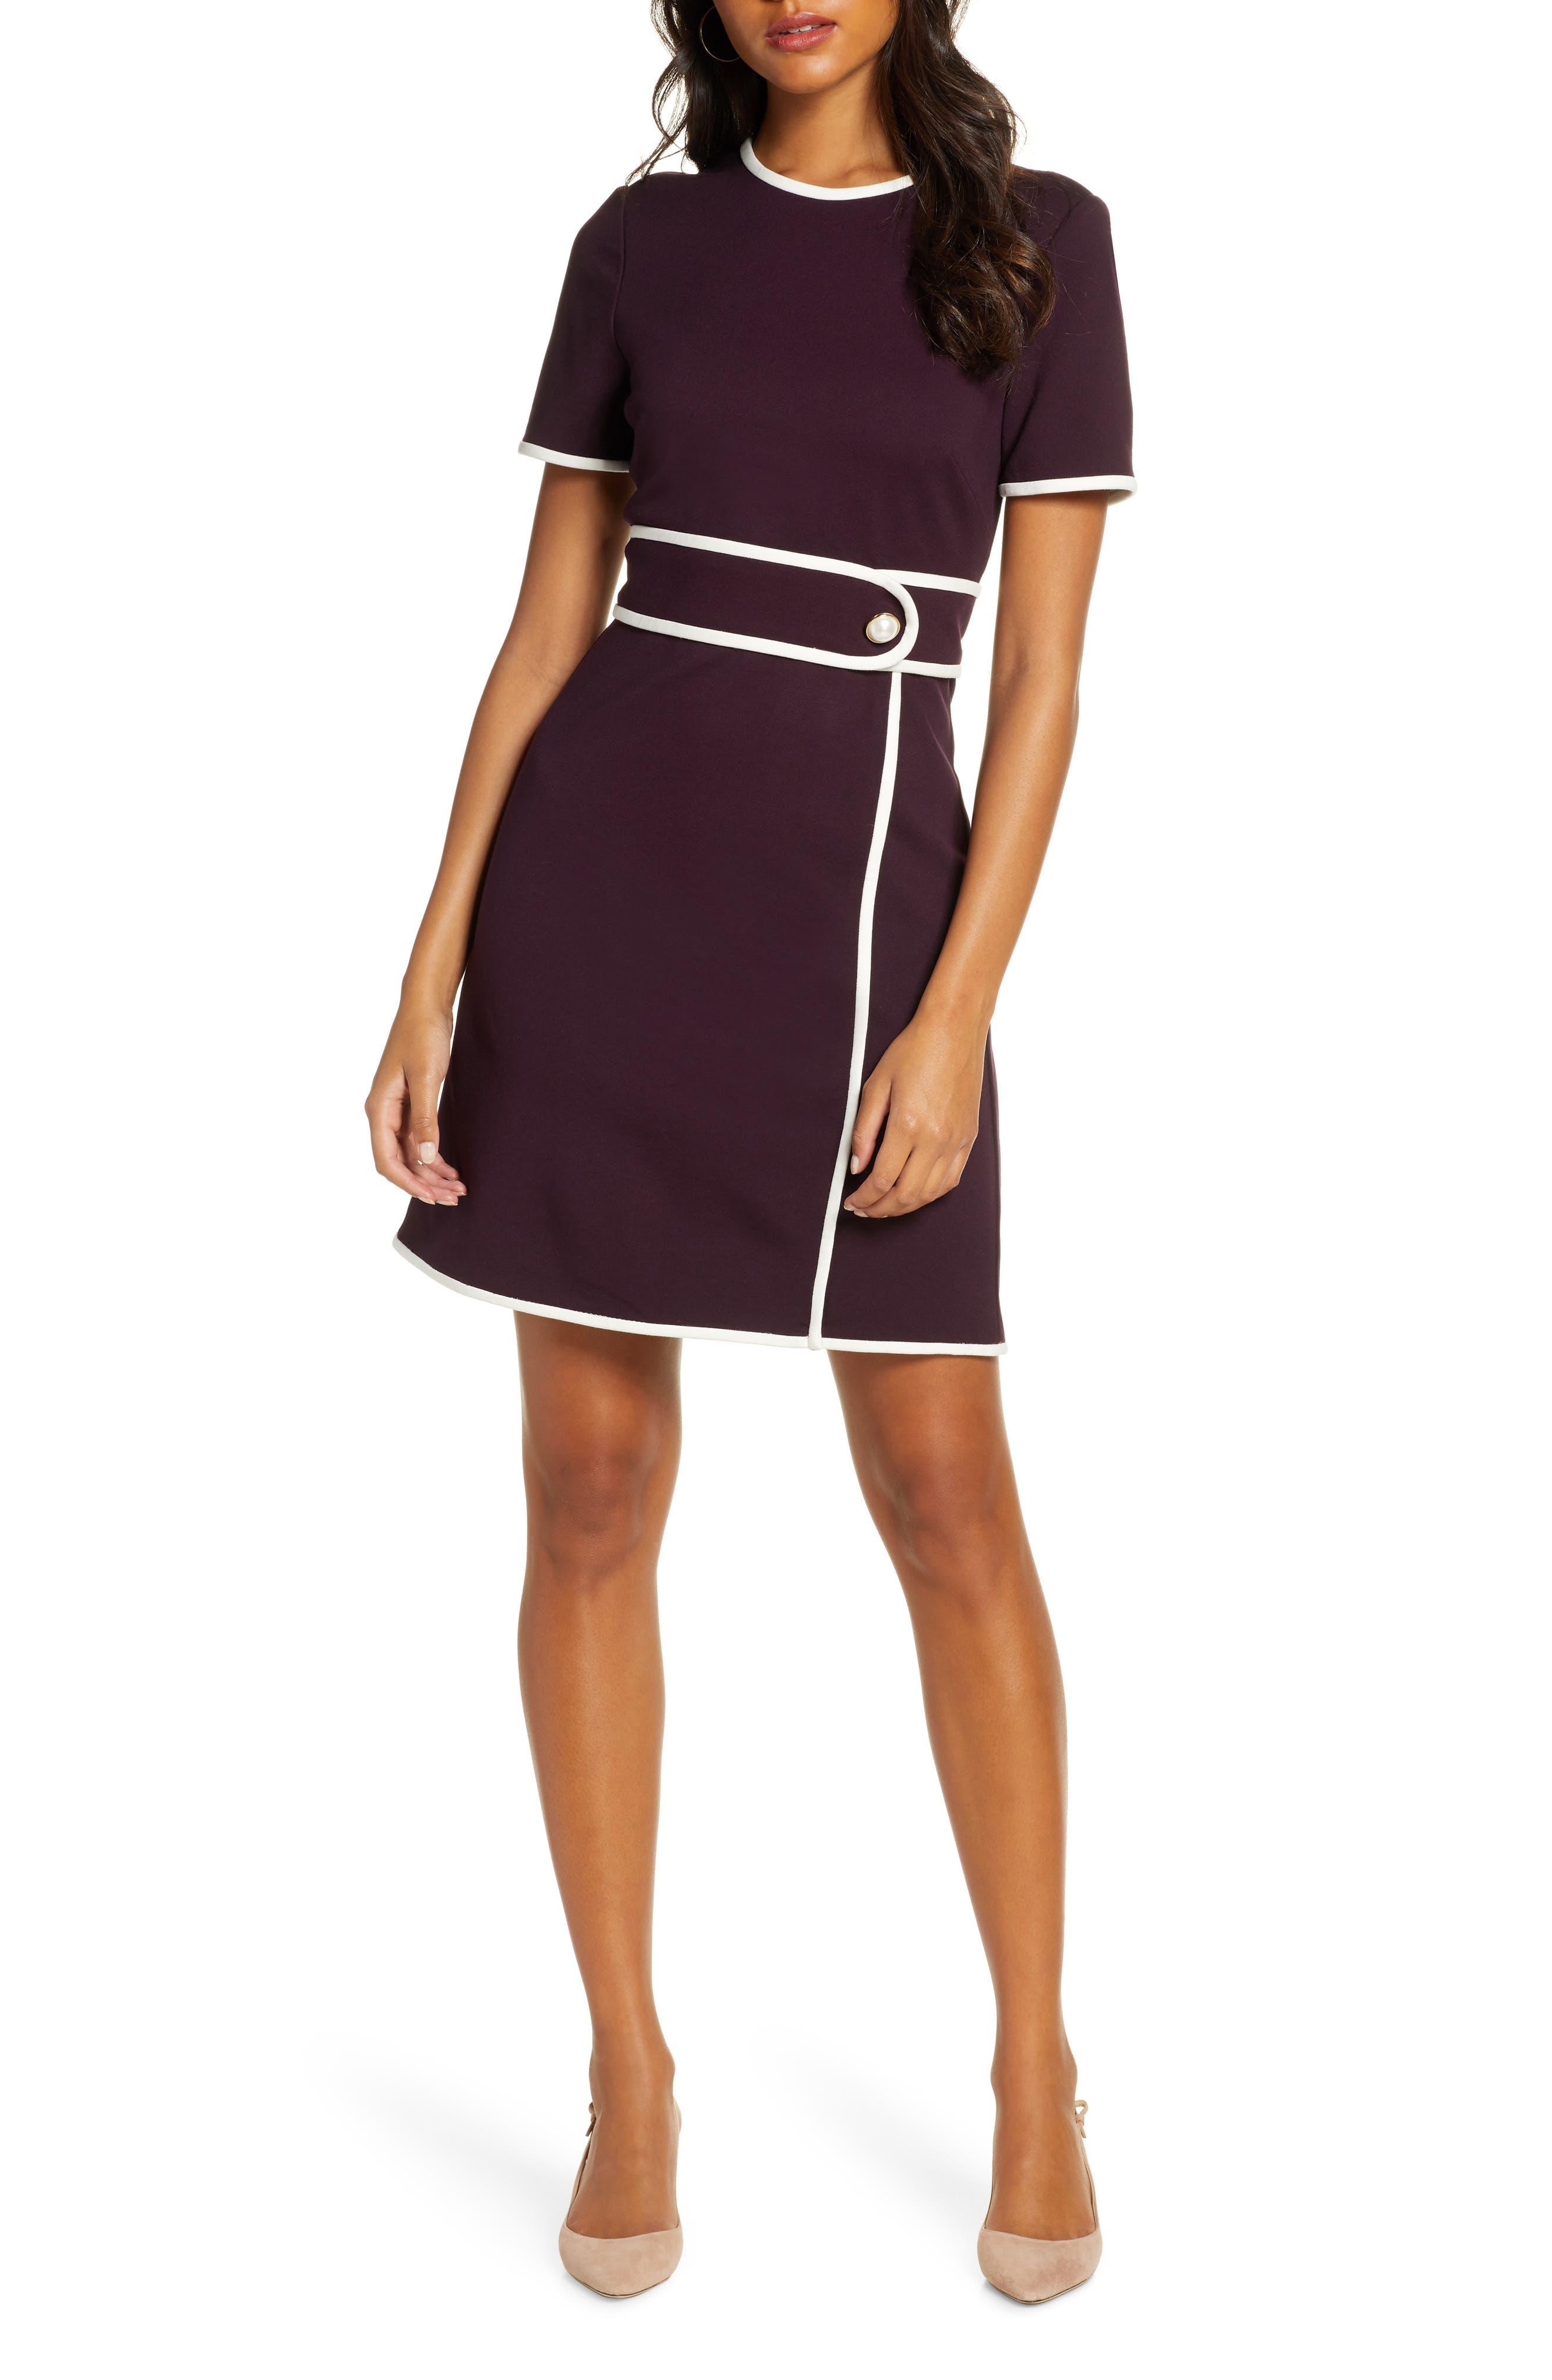 60s Dresses | 1960s Dresses Mod, Mini, Hippie Womens 1901 Belt Detail Sheath Dress $129.00 AT vintagedancer.com